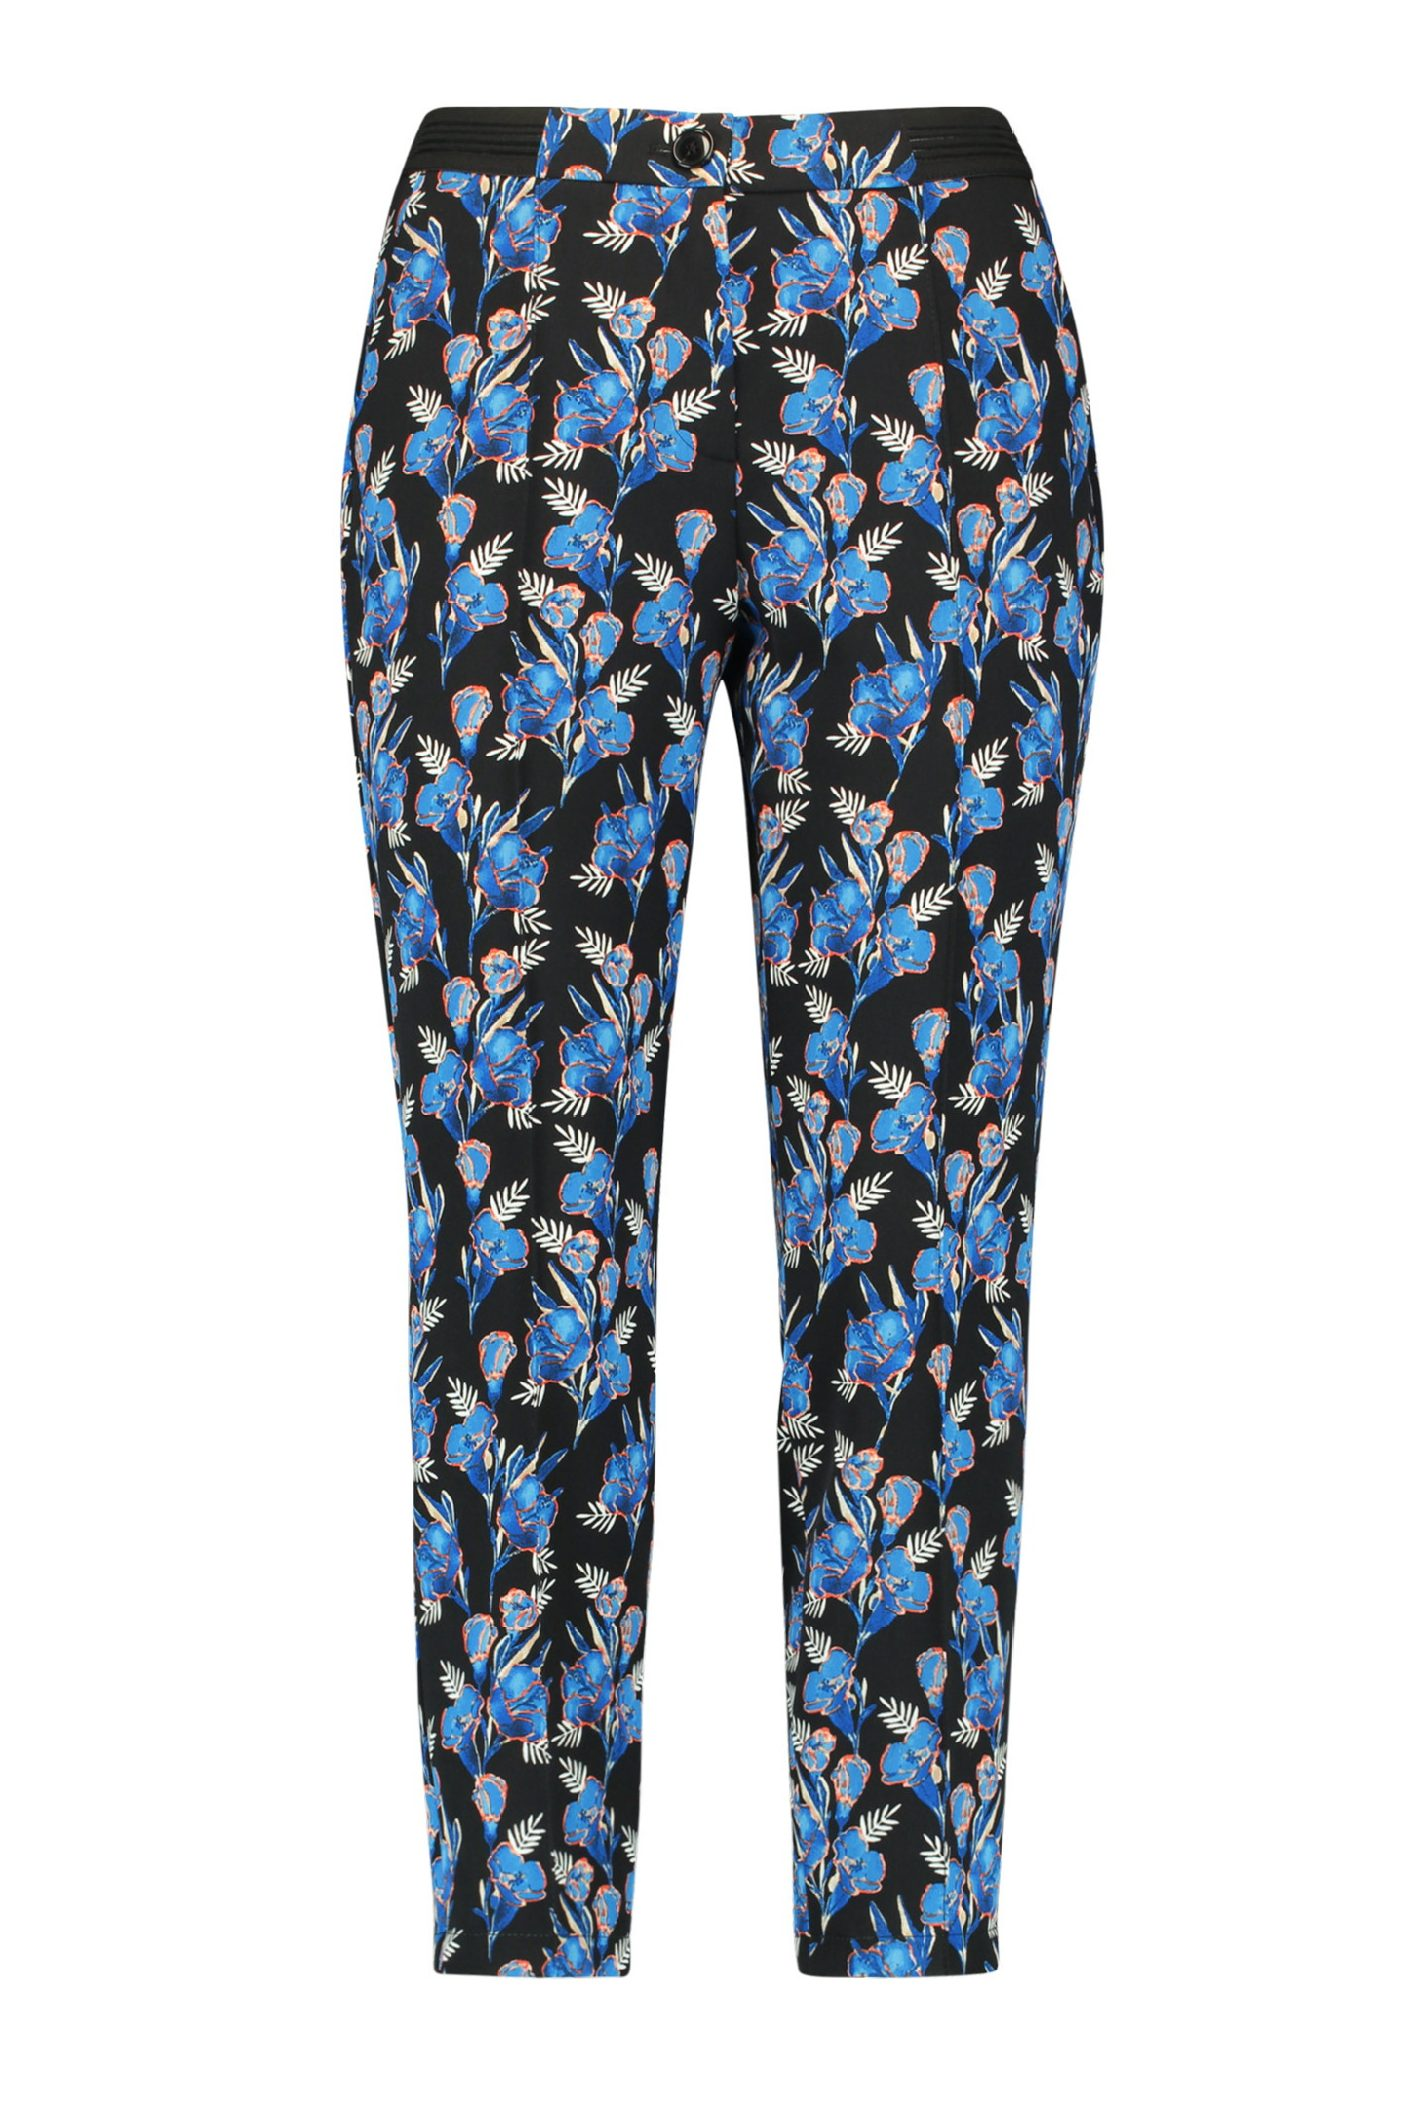 GERRY WEBER – Bukser i 7/8 del med blomster